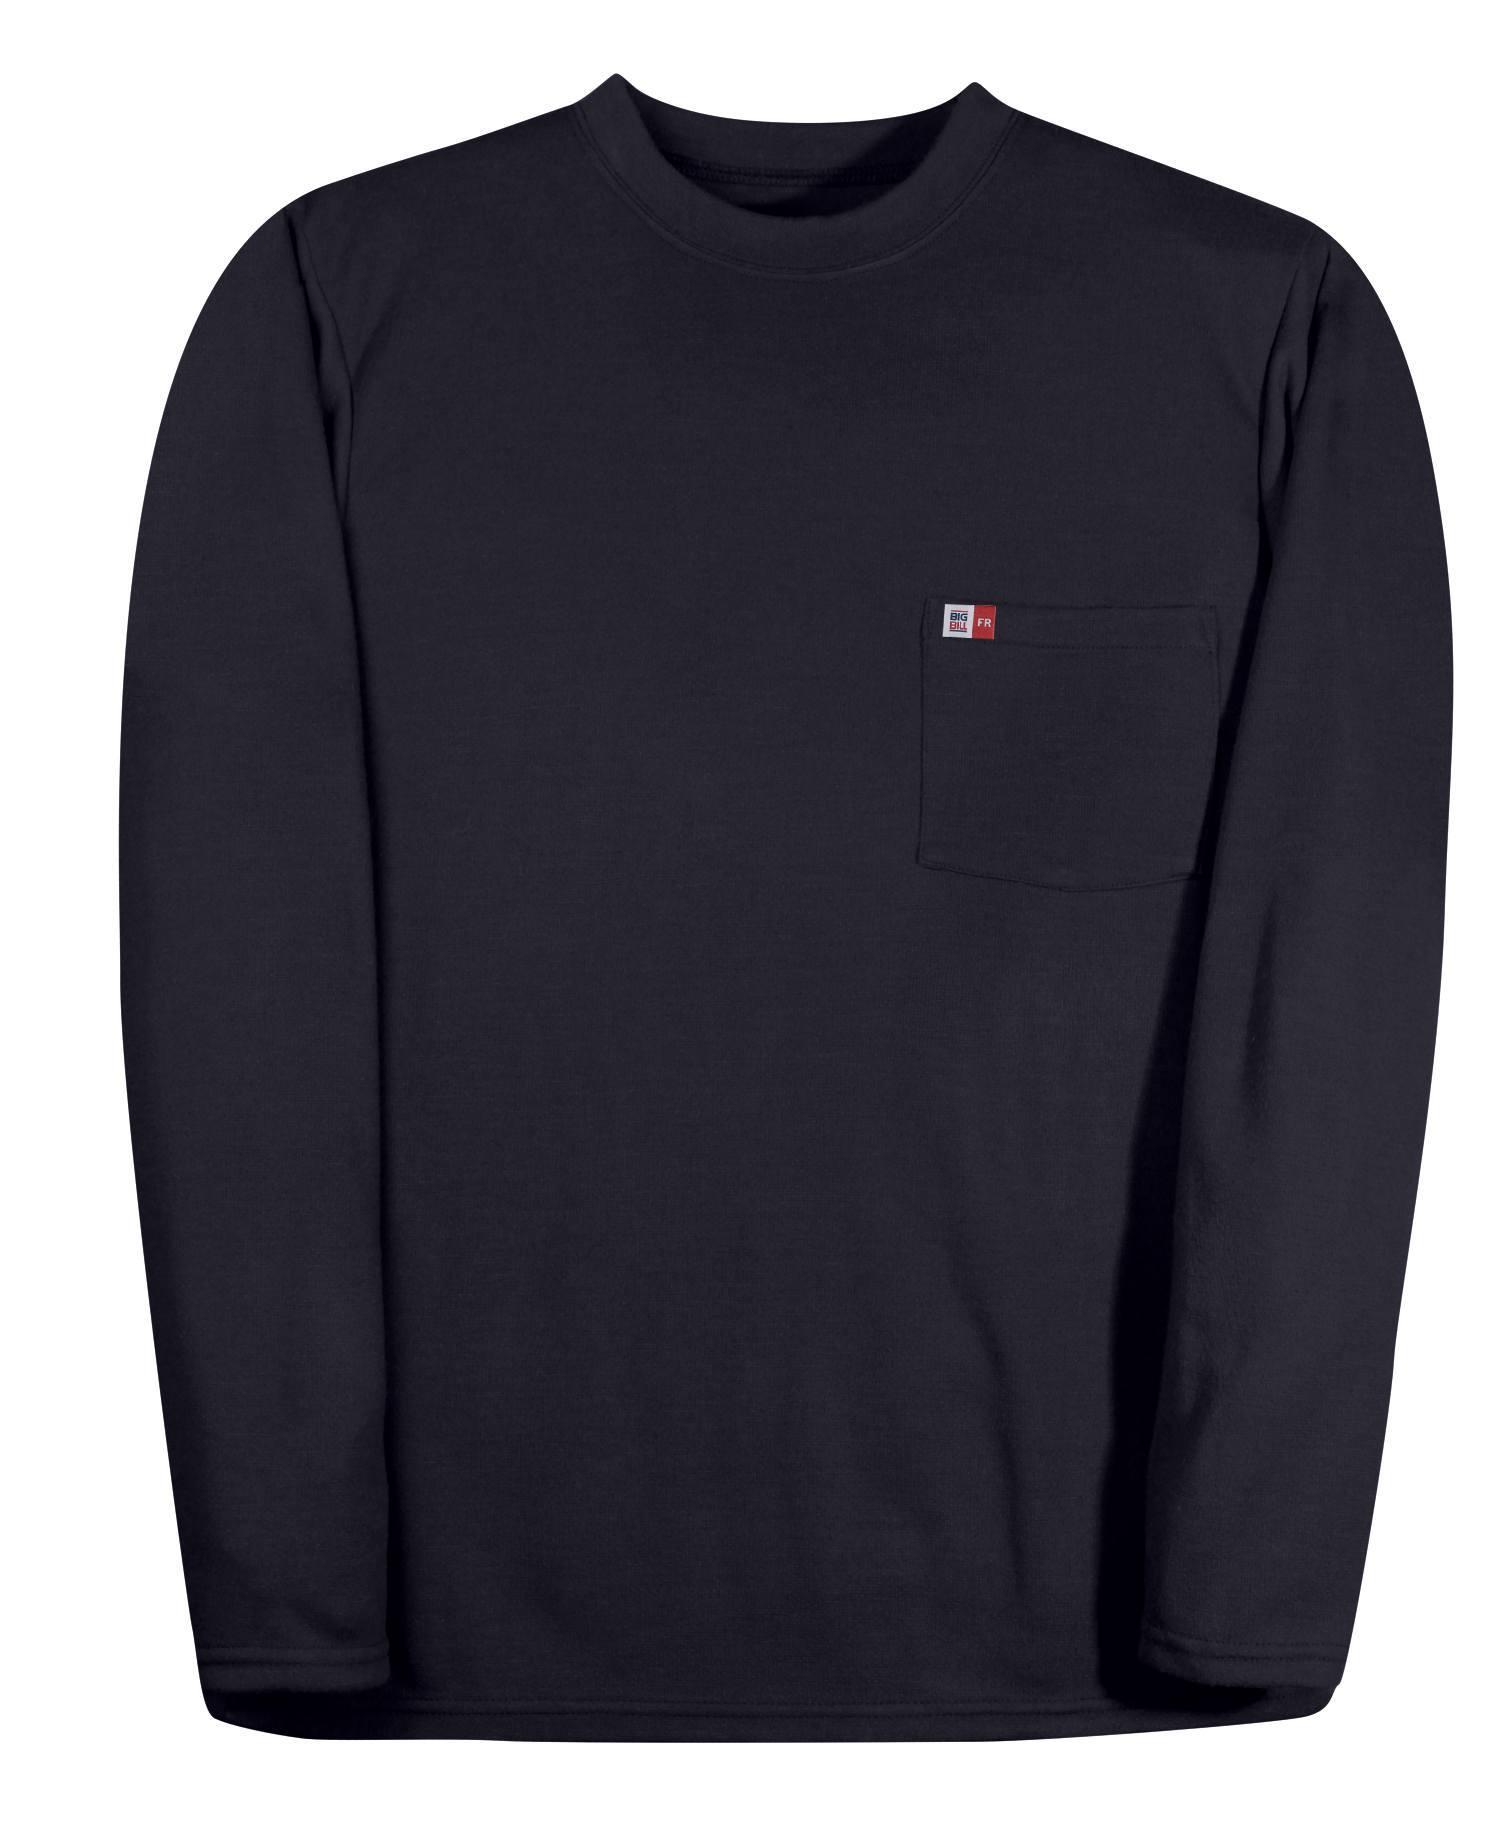 5.2 oz Polartec Power Dry® T-Shirt Long Sleeve-BIG BILL